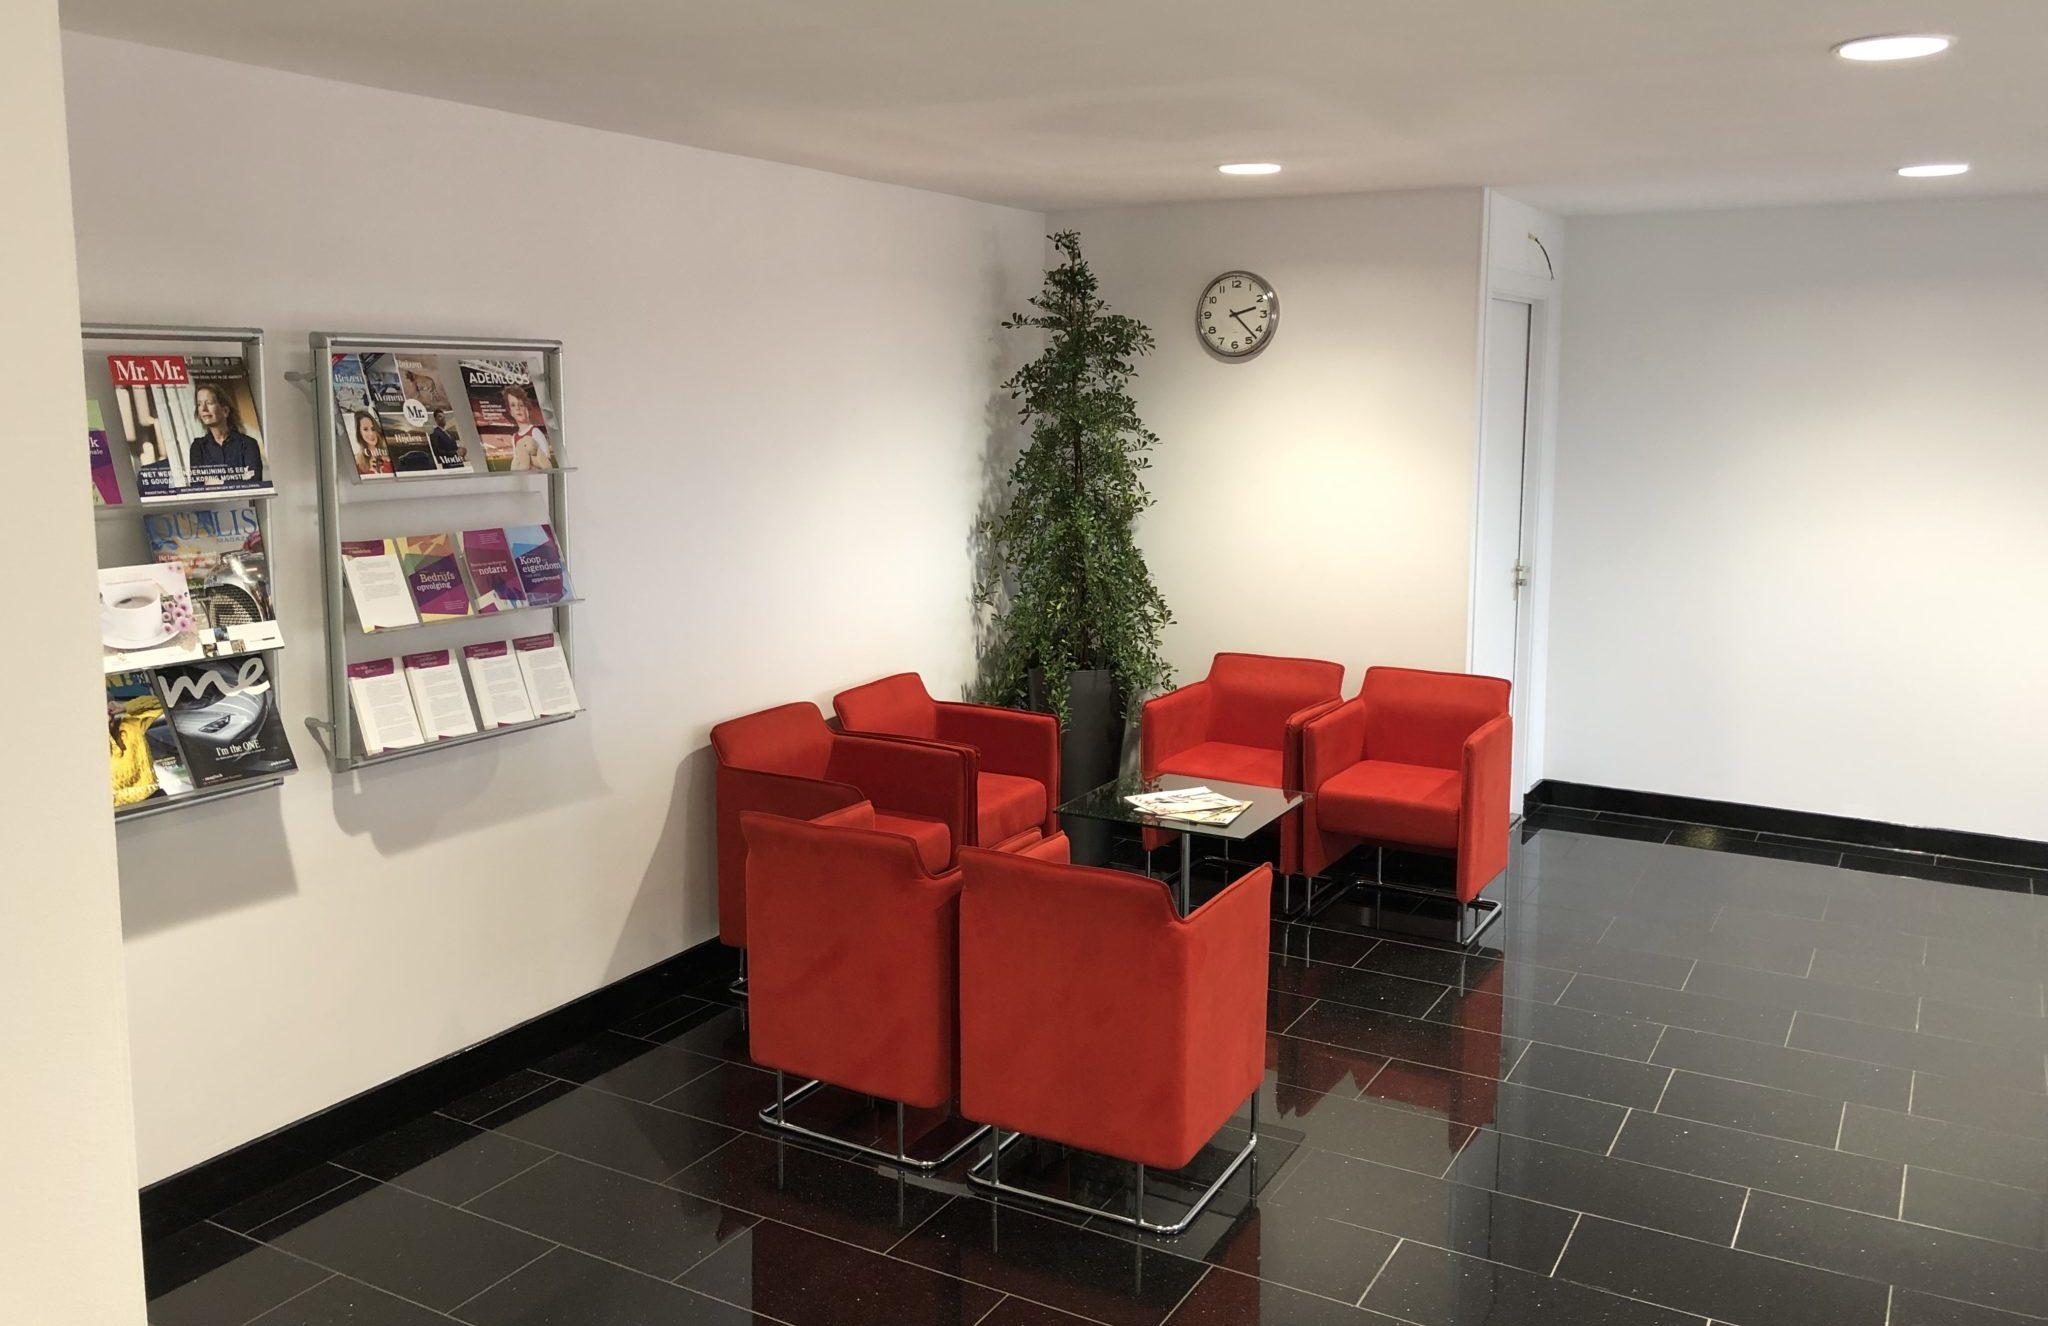 codex legal project Heering Office Den Haag